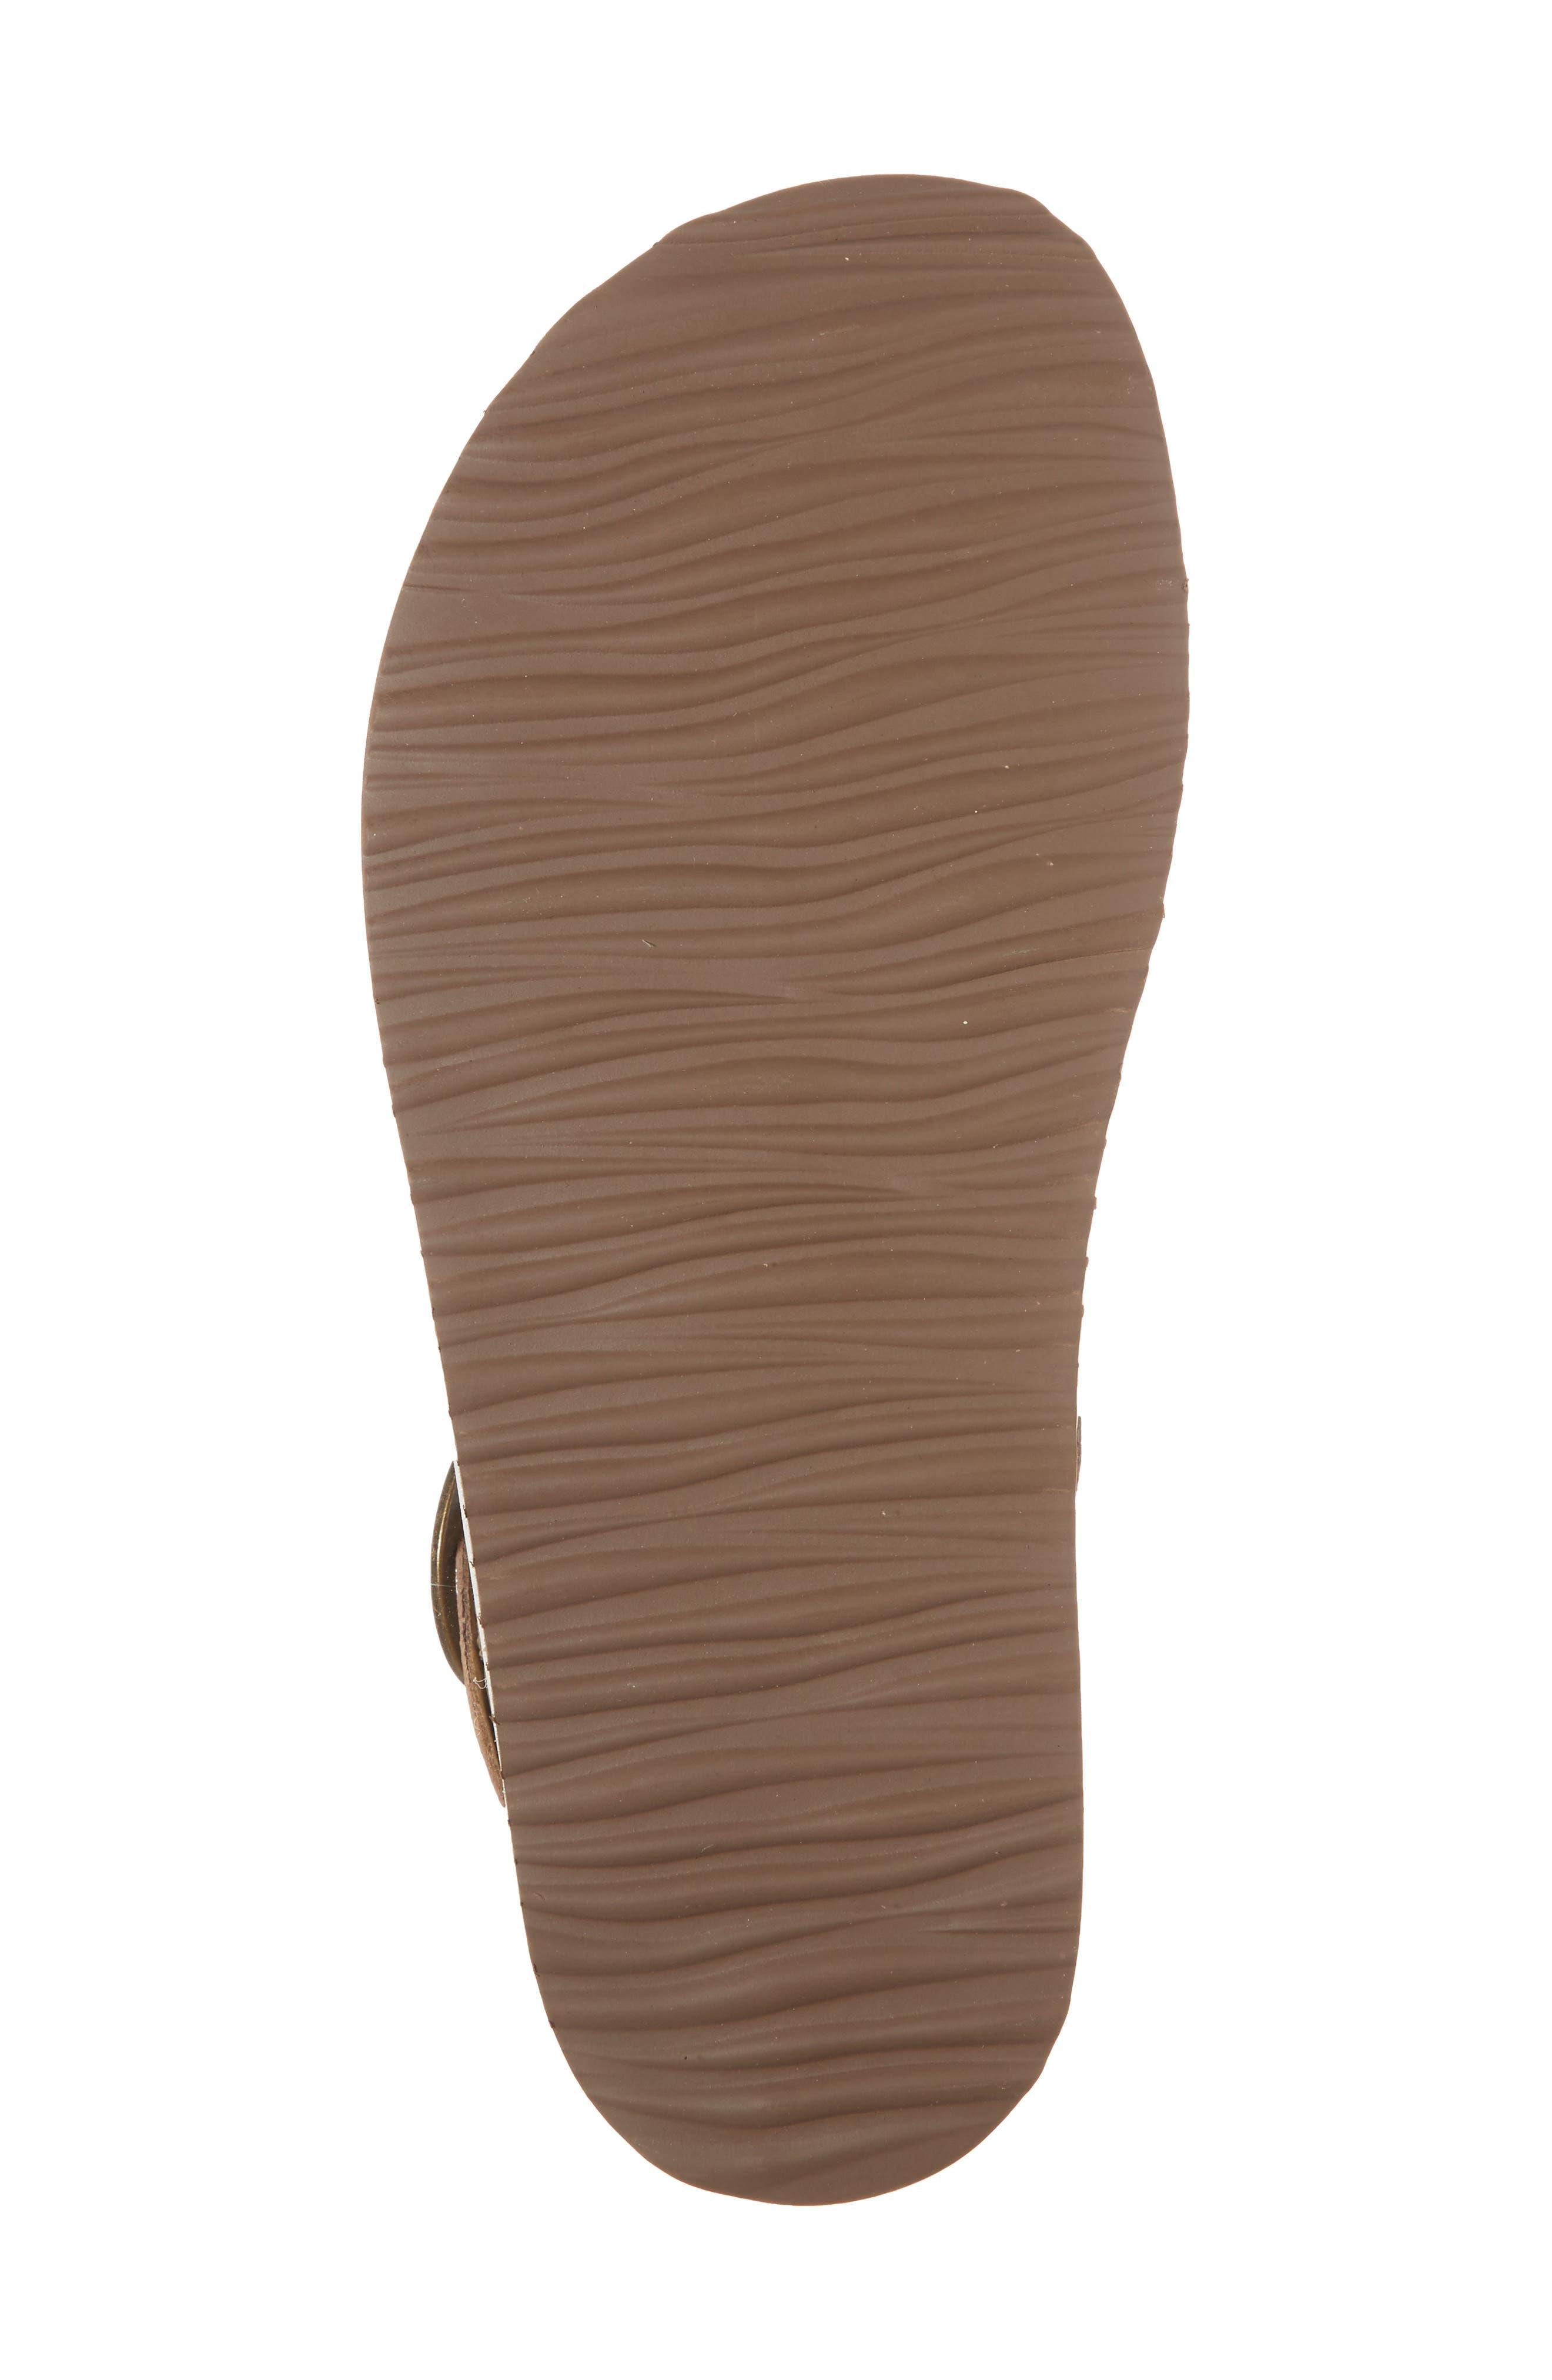 Adrianna Genuine Calf Hair Sandal,                             Alternate thumbnail 6, color,                             Gold Pony Leather